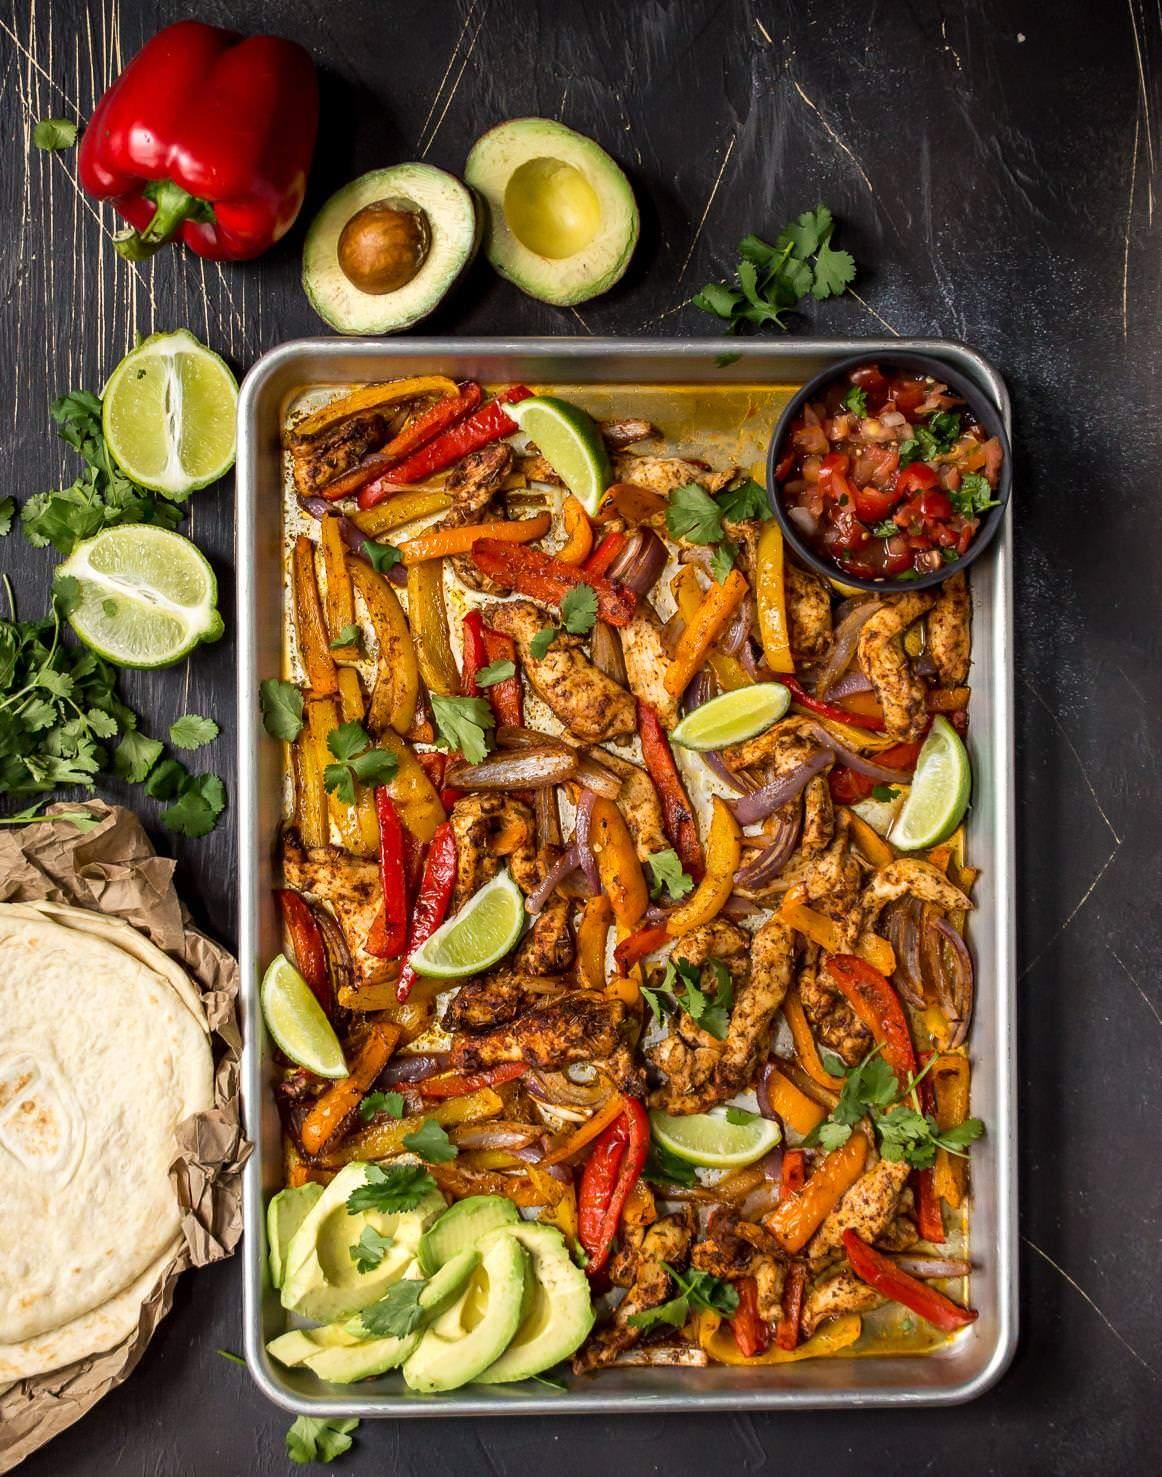 whole30 dinner of sheet pan chicken fajitas